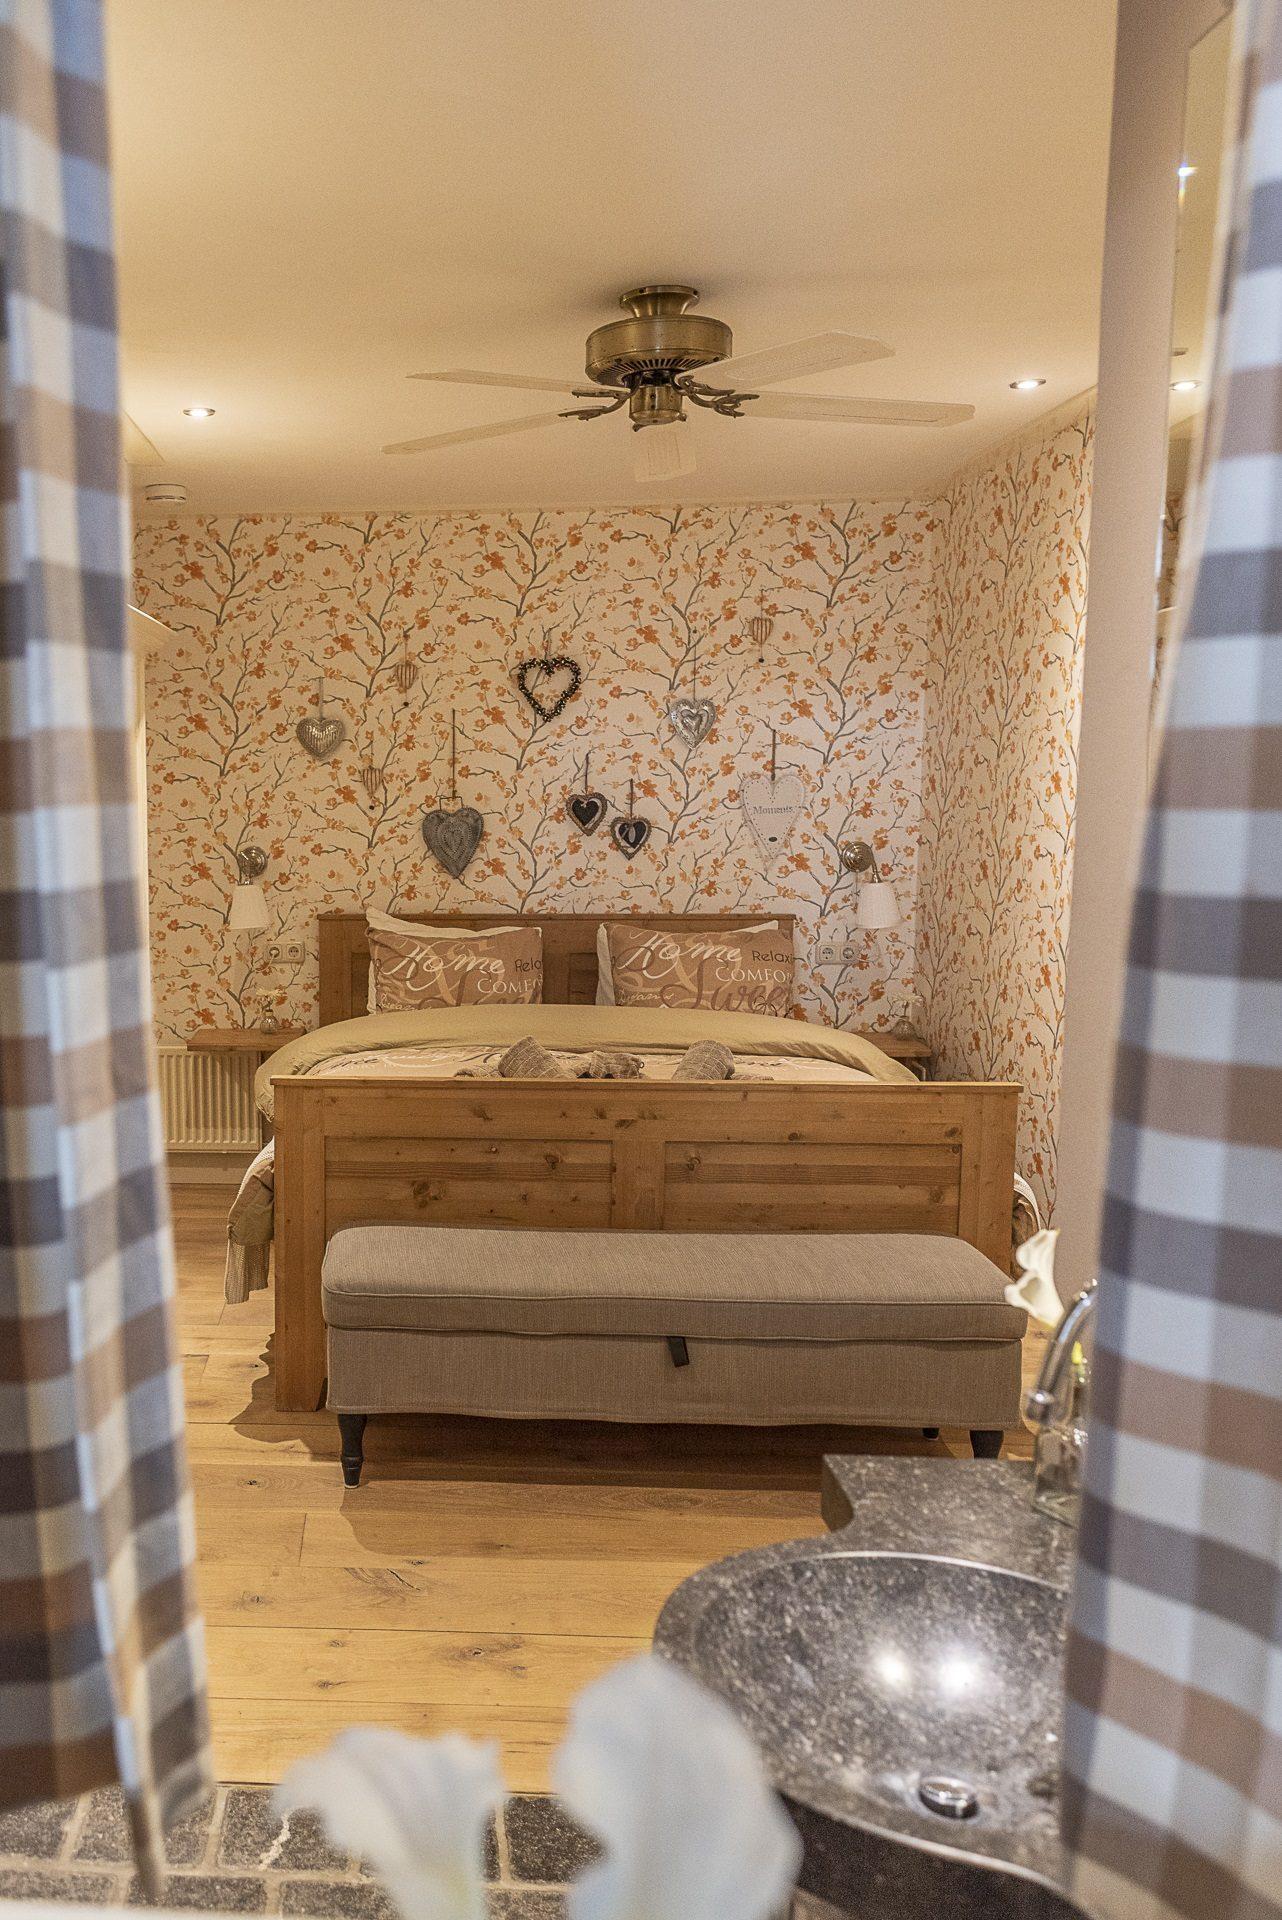 Slaapkamer inkijk